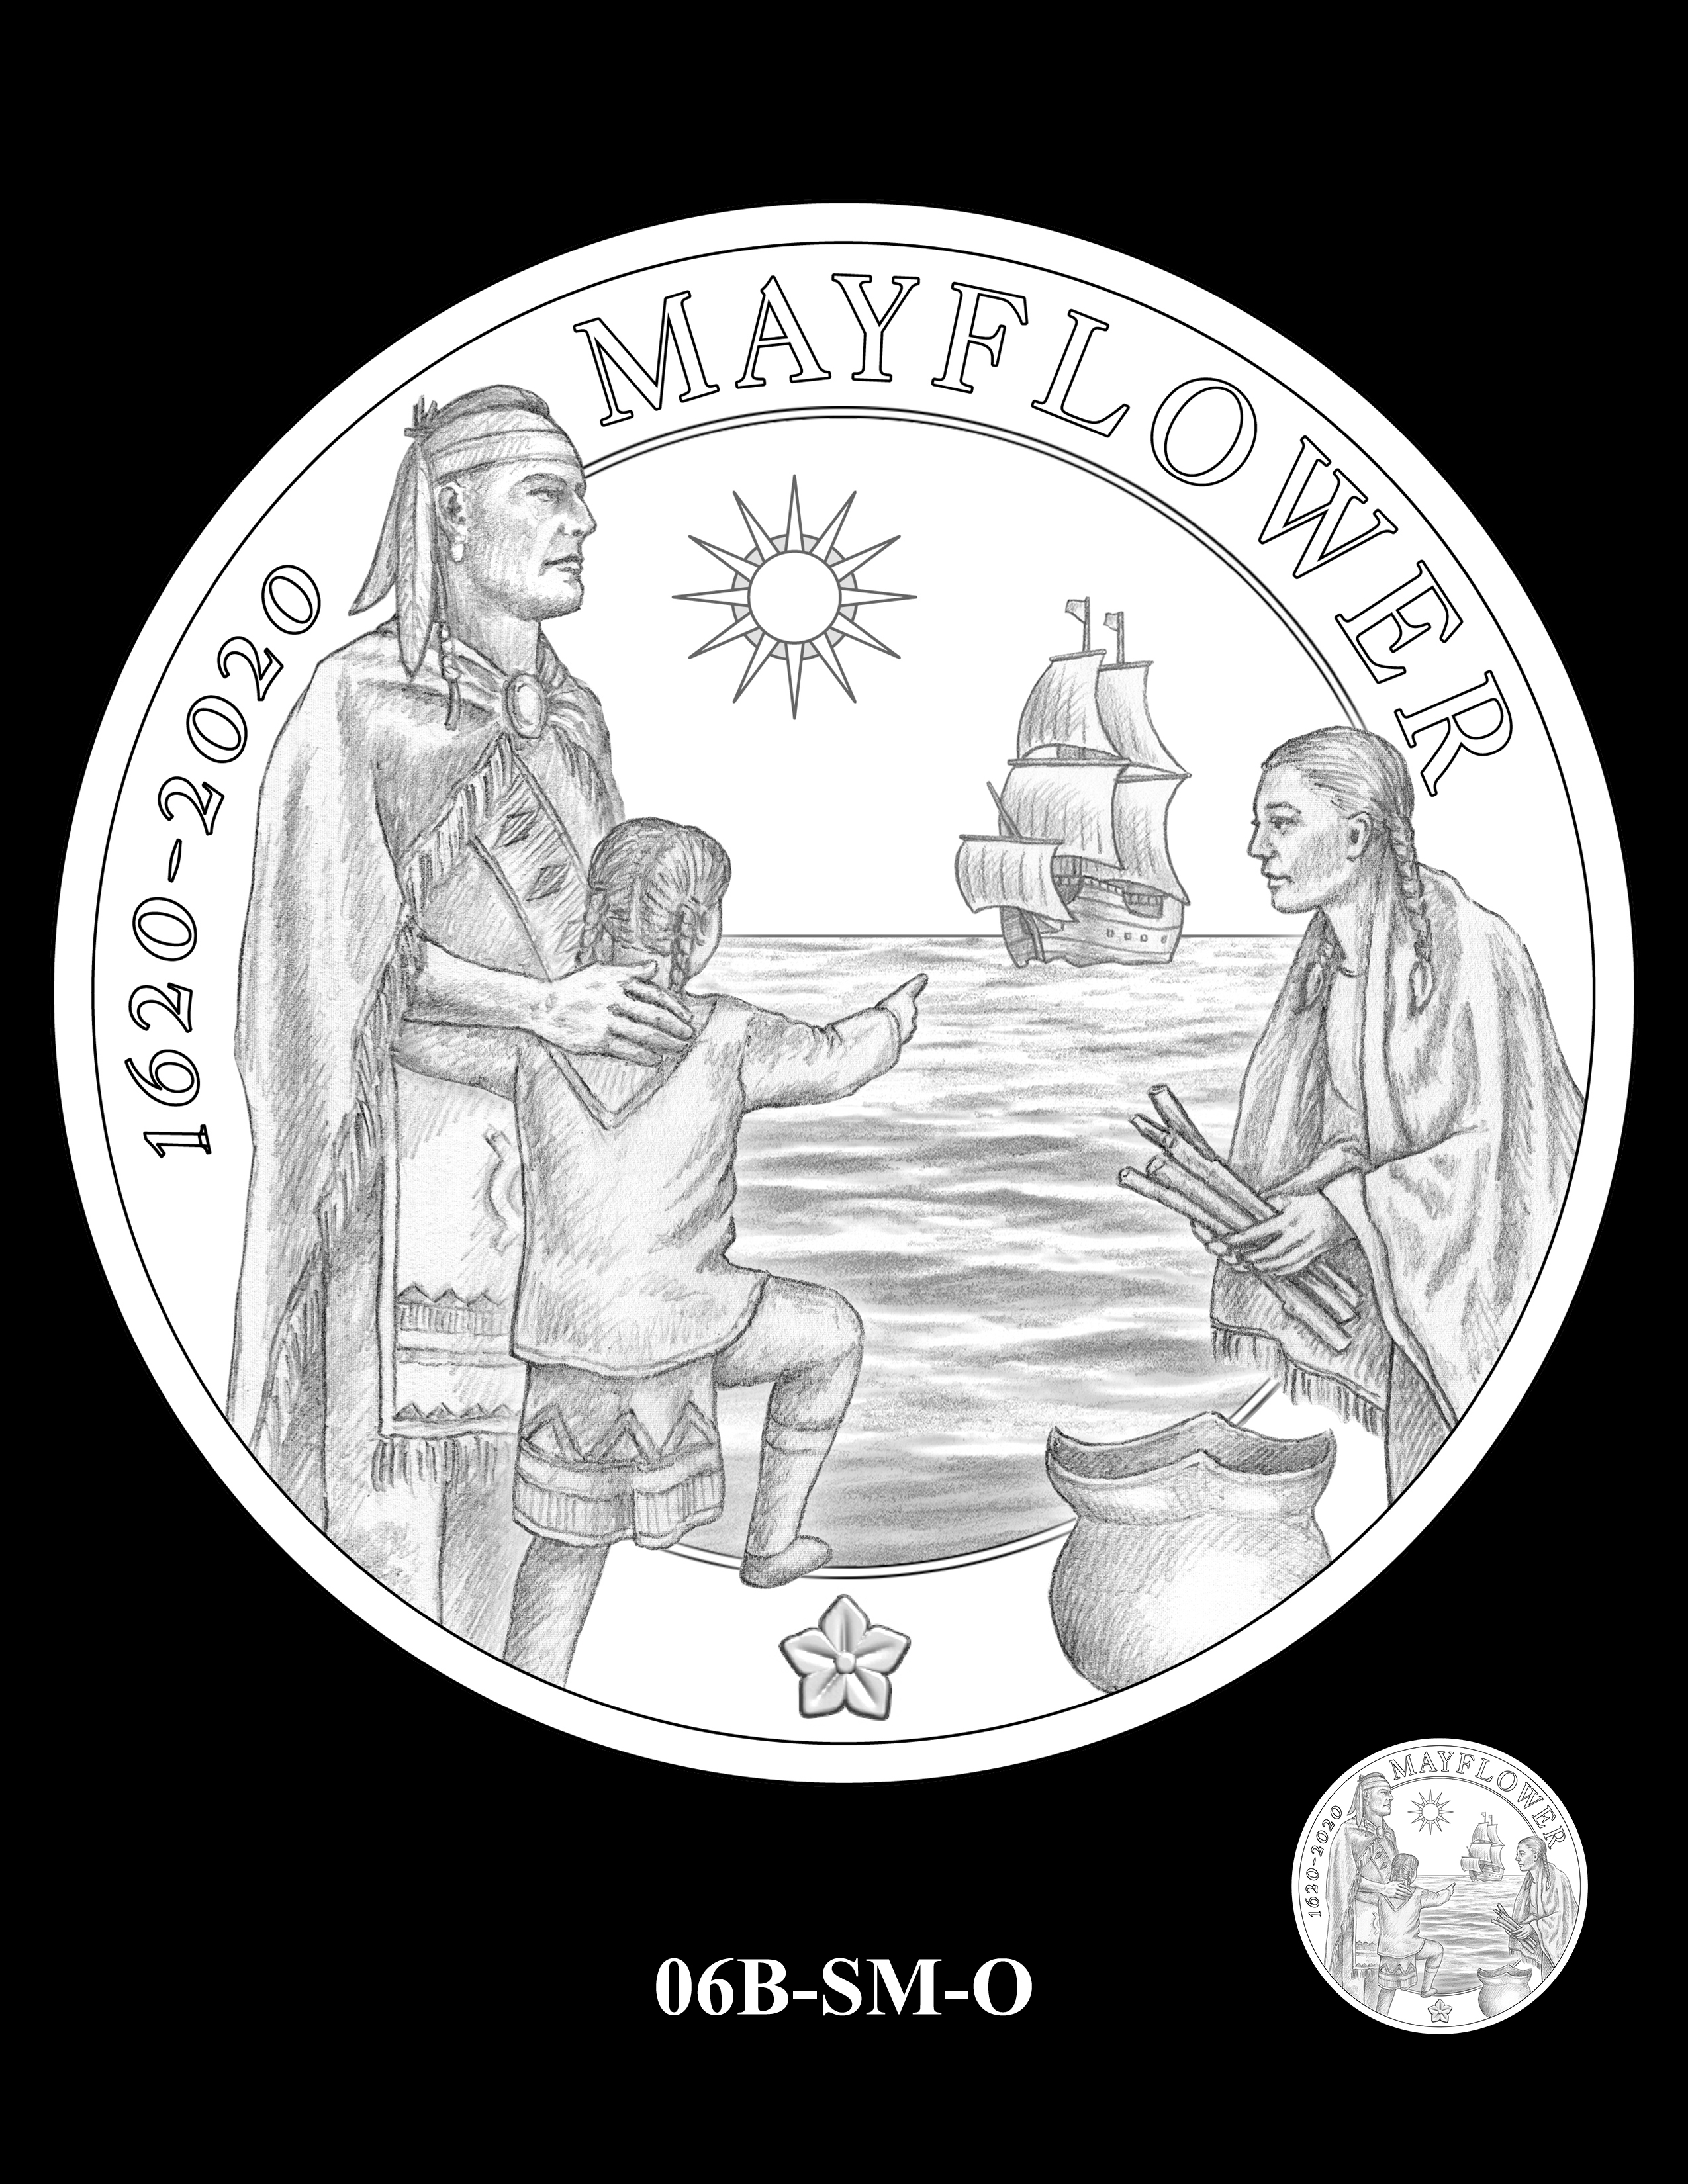 06B-SM-O - 2020 Mayflower 400th Anniversary 24K Gold Coin & Silver Medal Program